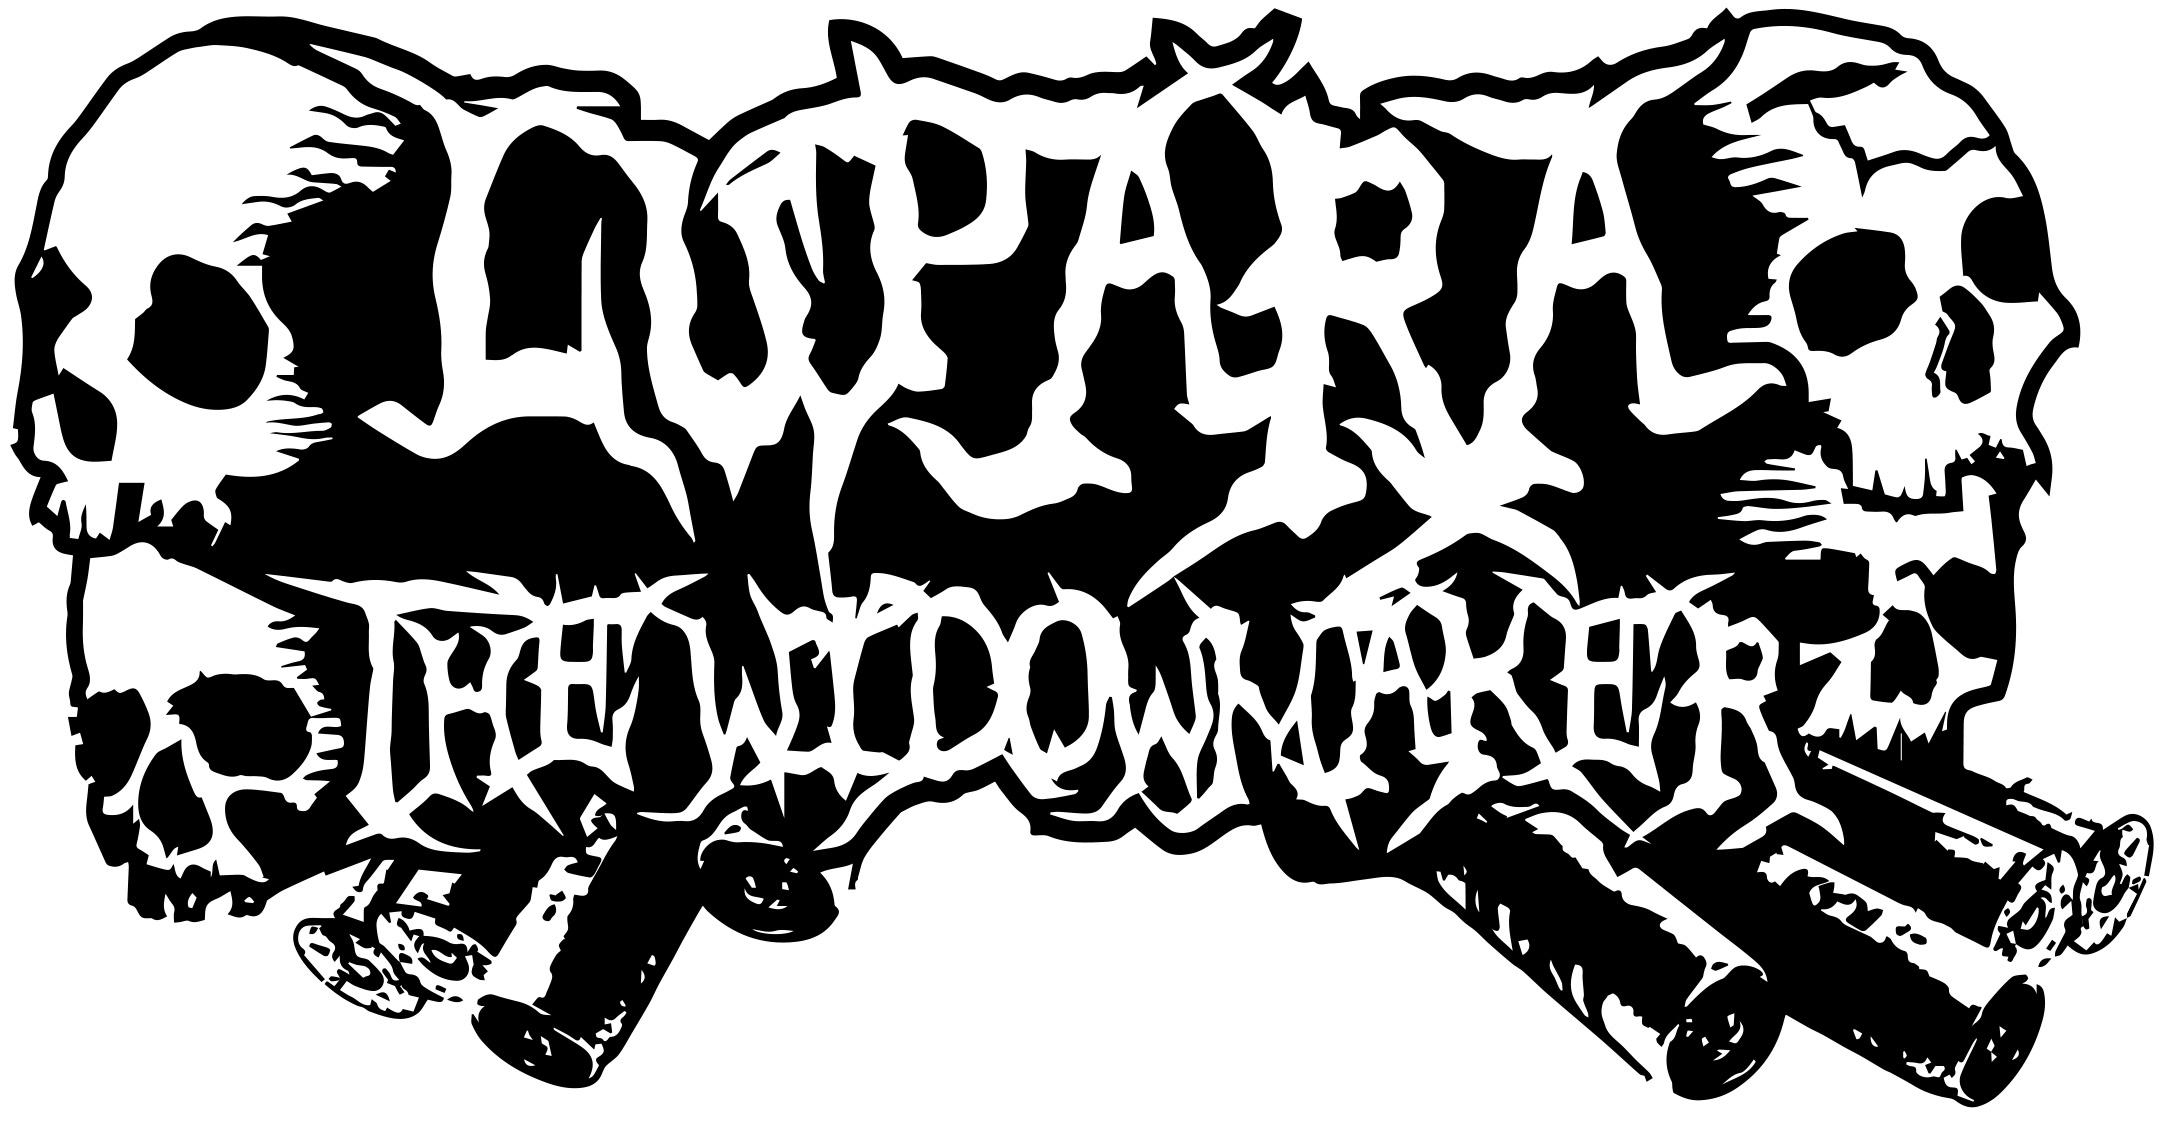 Lupara-enhanced-logo